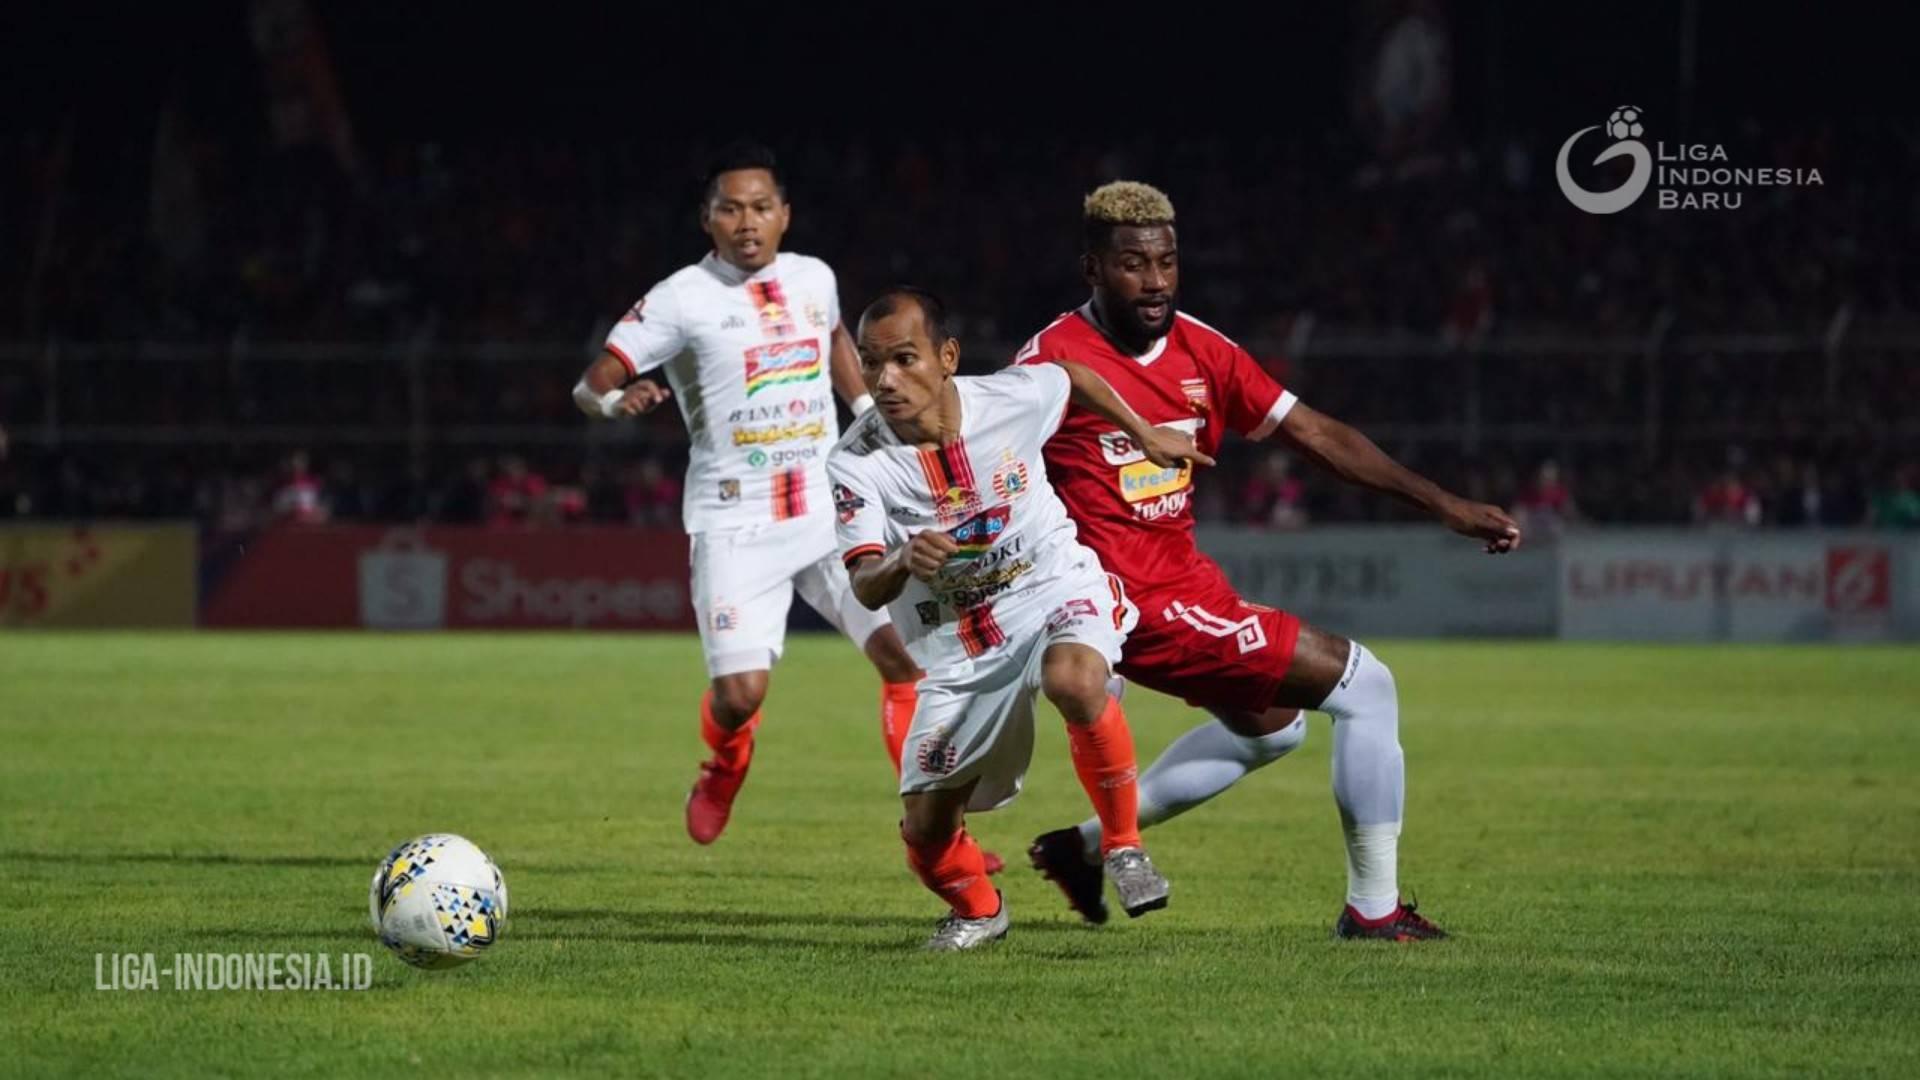 Persija's Loss Heats Up Relegation Battle